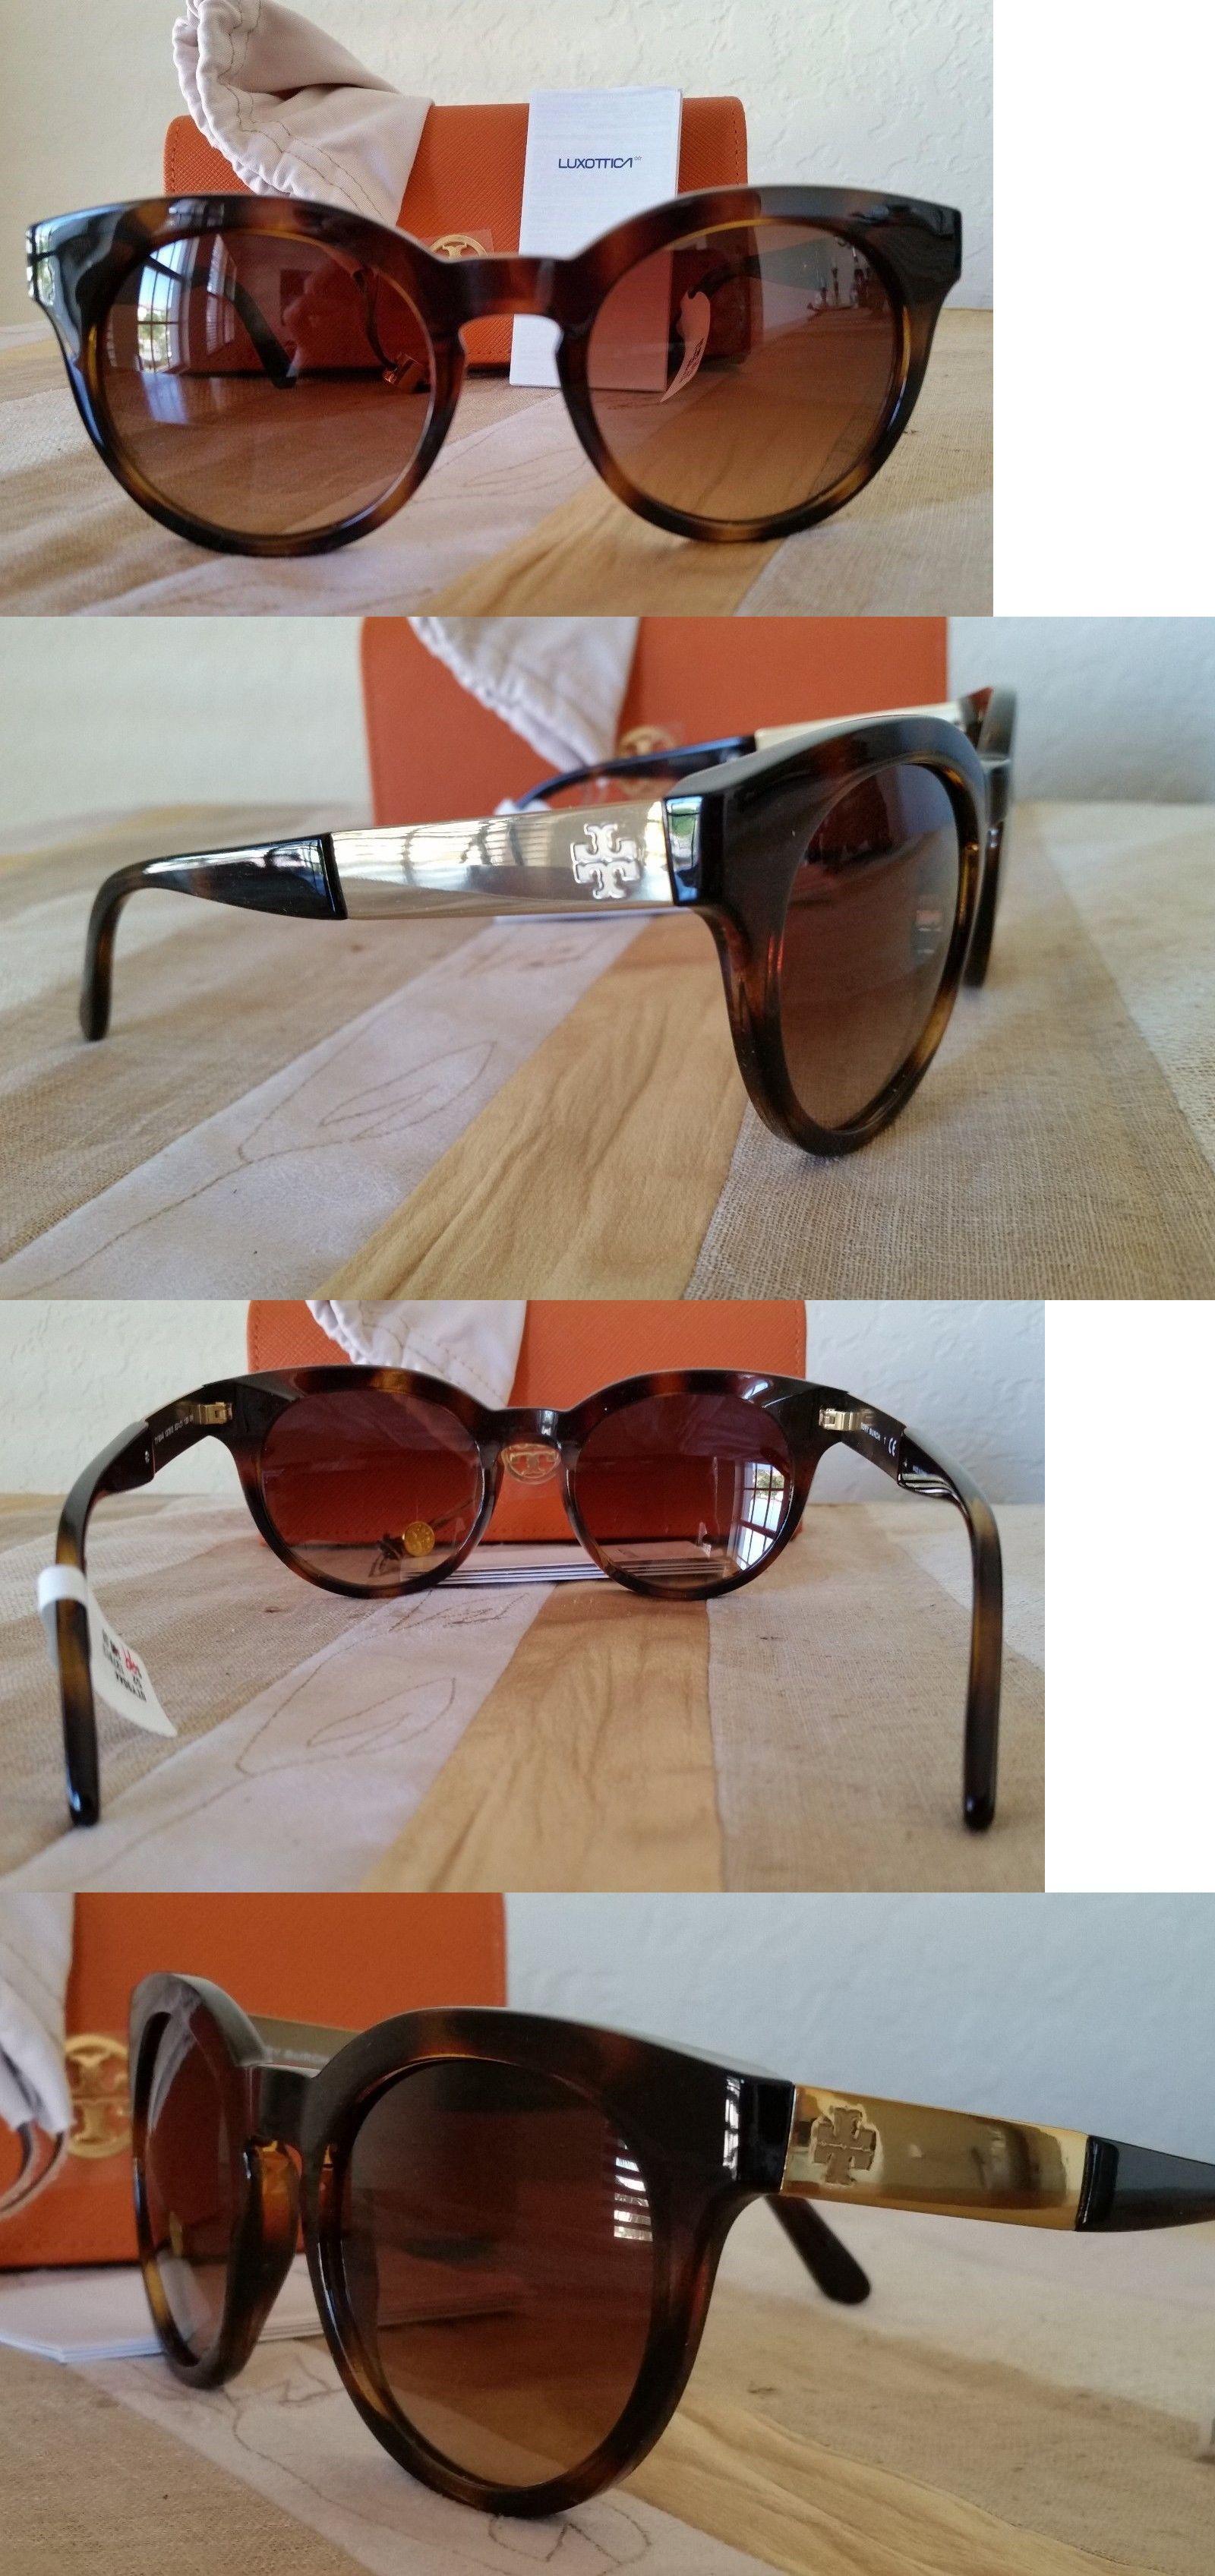 155b0074fcf3 Fashion Eyewear Clear Glasses 179248  Tory Burch Women Debossed-T Round Brown  Gradient Sunglasses +Orange Case Ty9044 -  BUY IT NOW ONLY   99 on eBay!